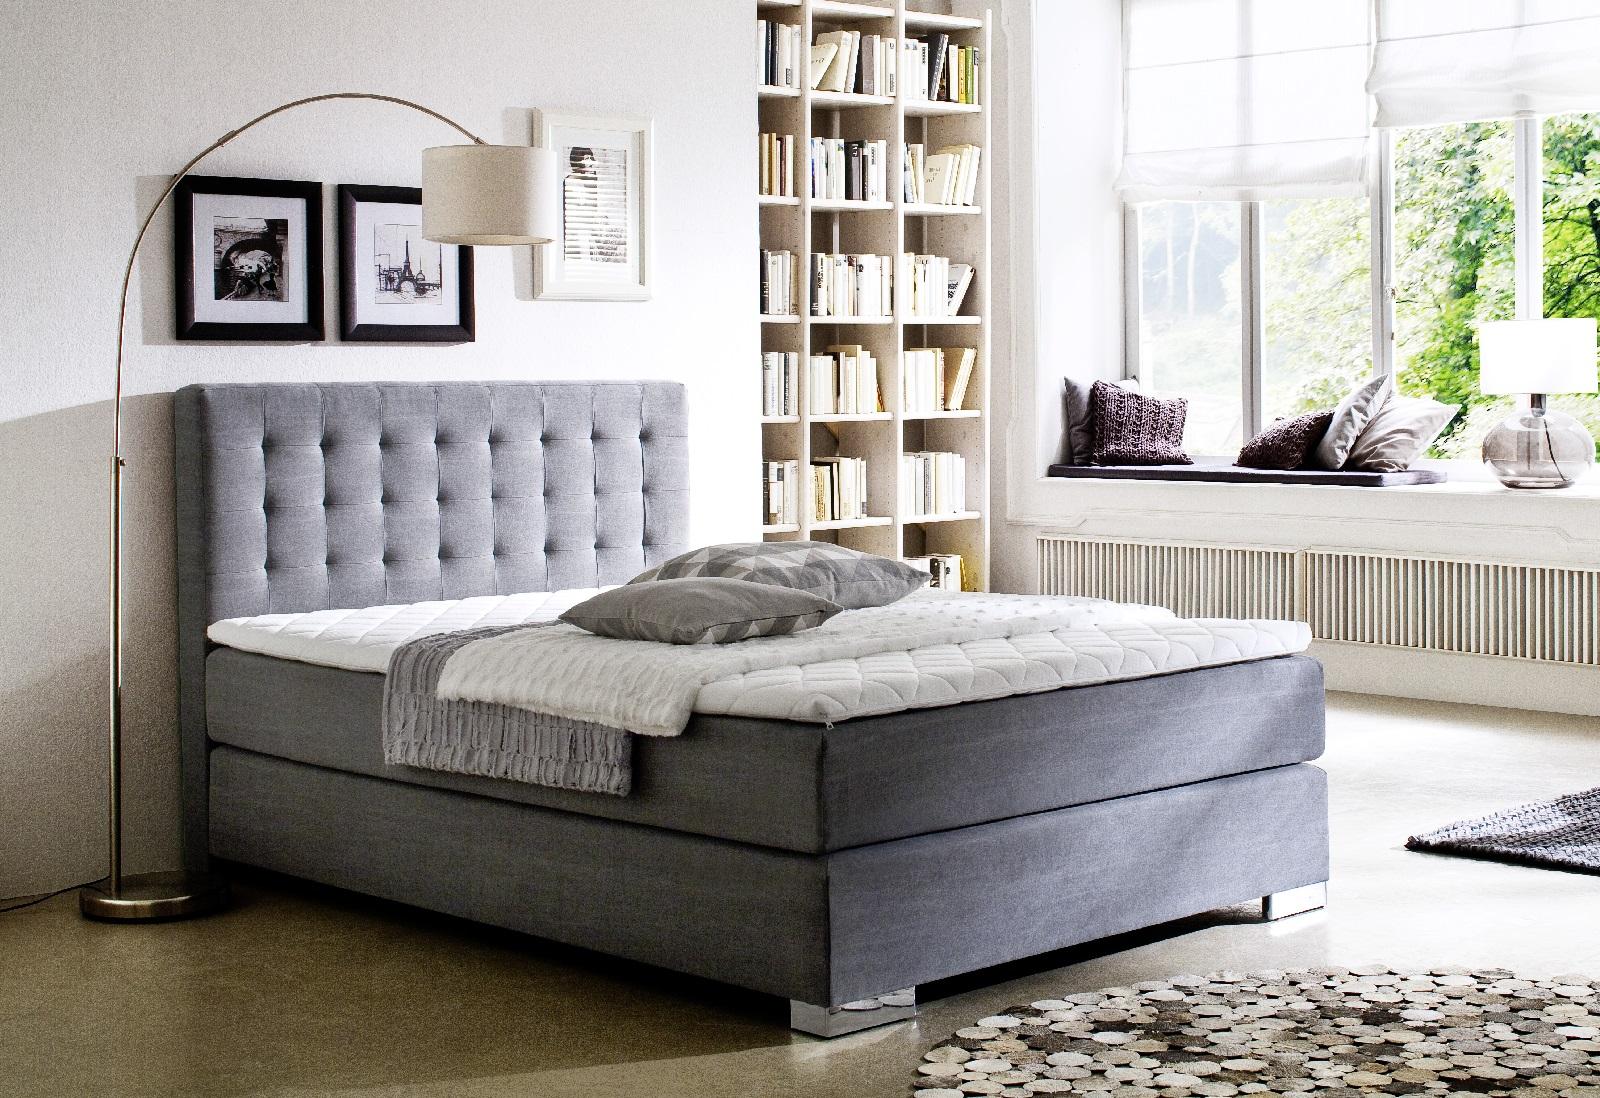 boxspringbett jordan graphit 140cm x 200cm. Black Bedroom Furniture Sets. Home Design Ideas